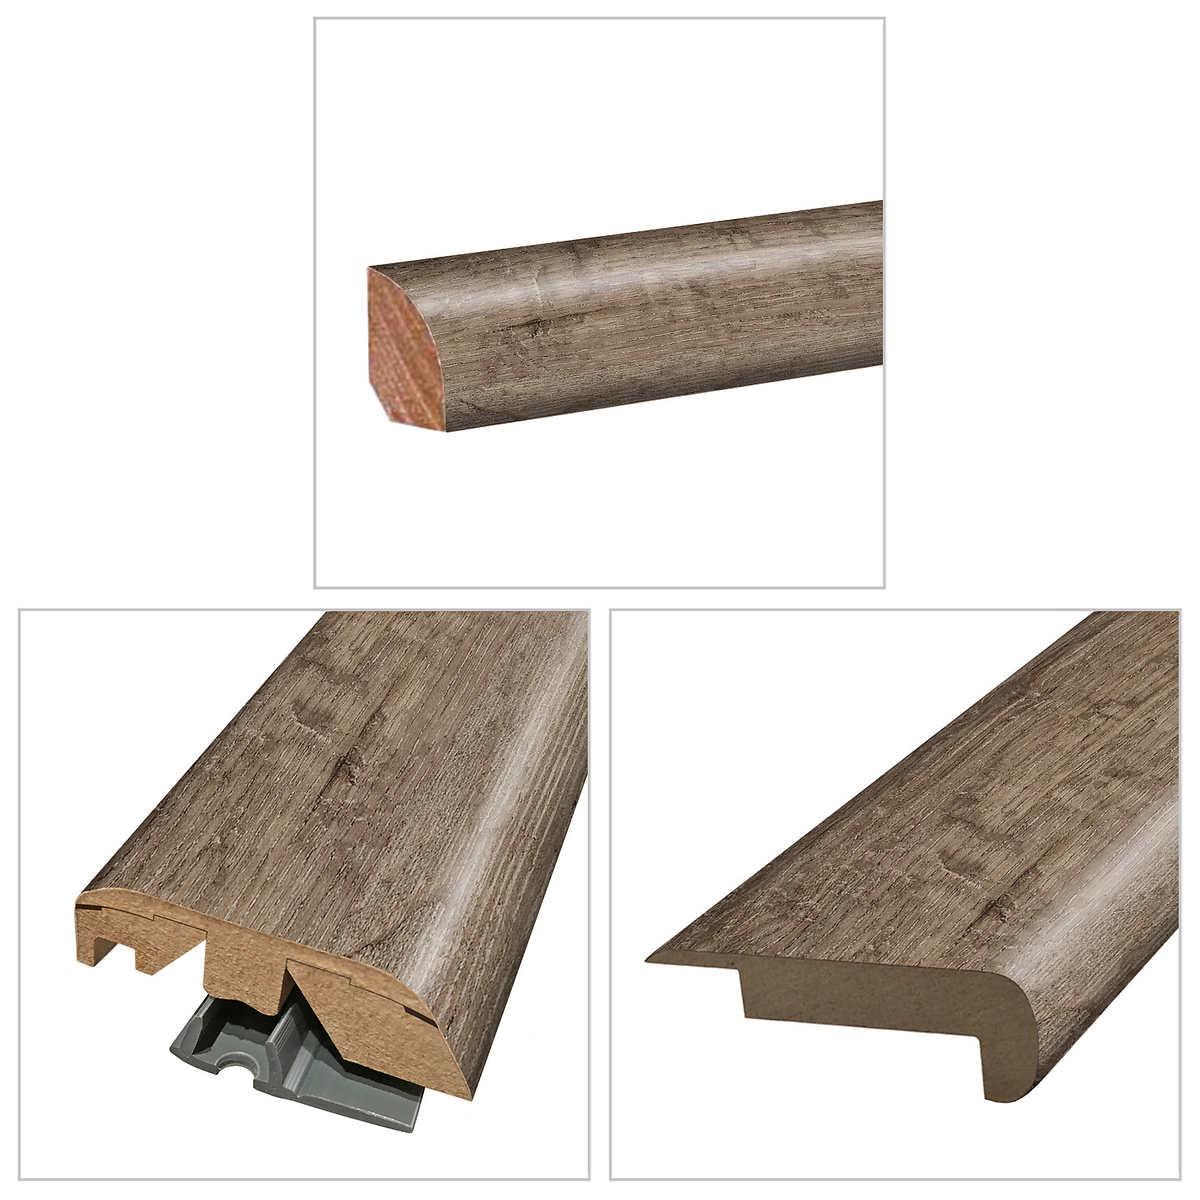 Mohawk Home Westmere Oak Laminate Floor, Mohawk Laminate Flooring Transitions